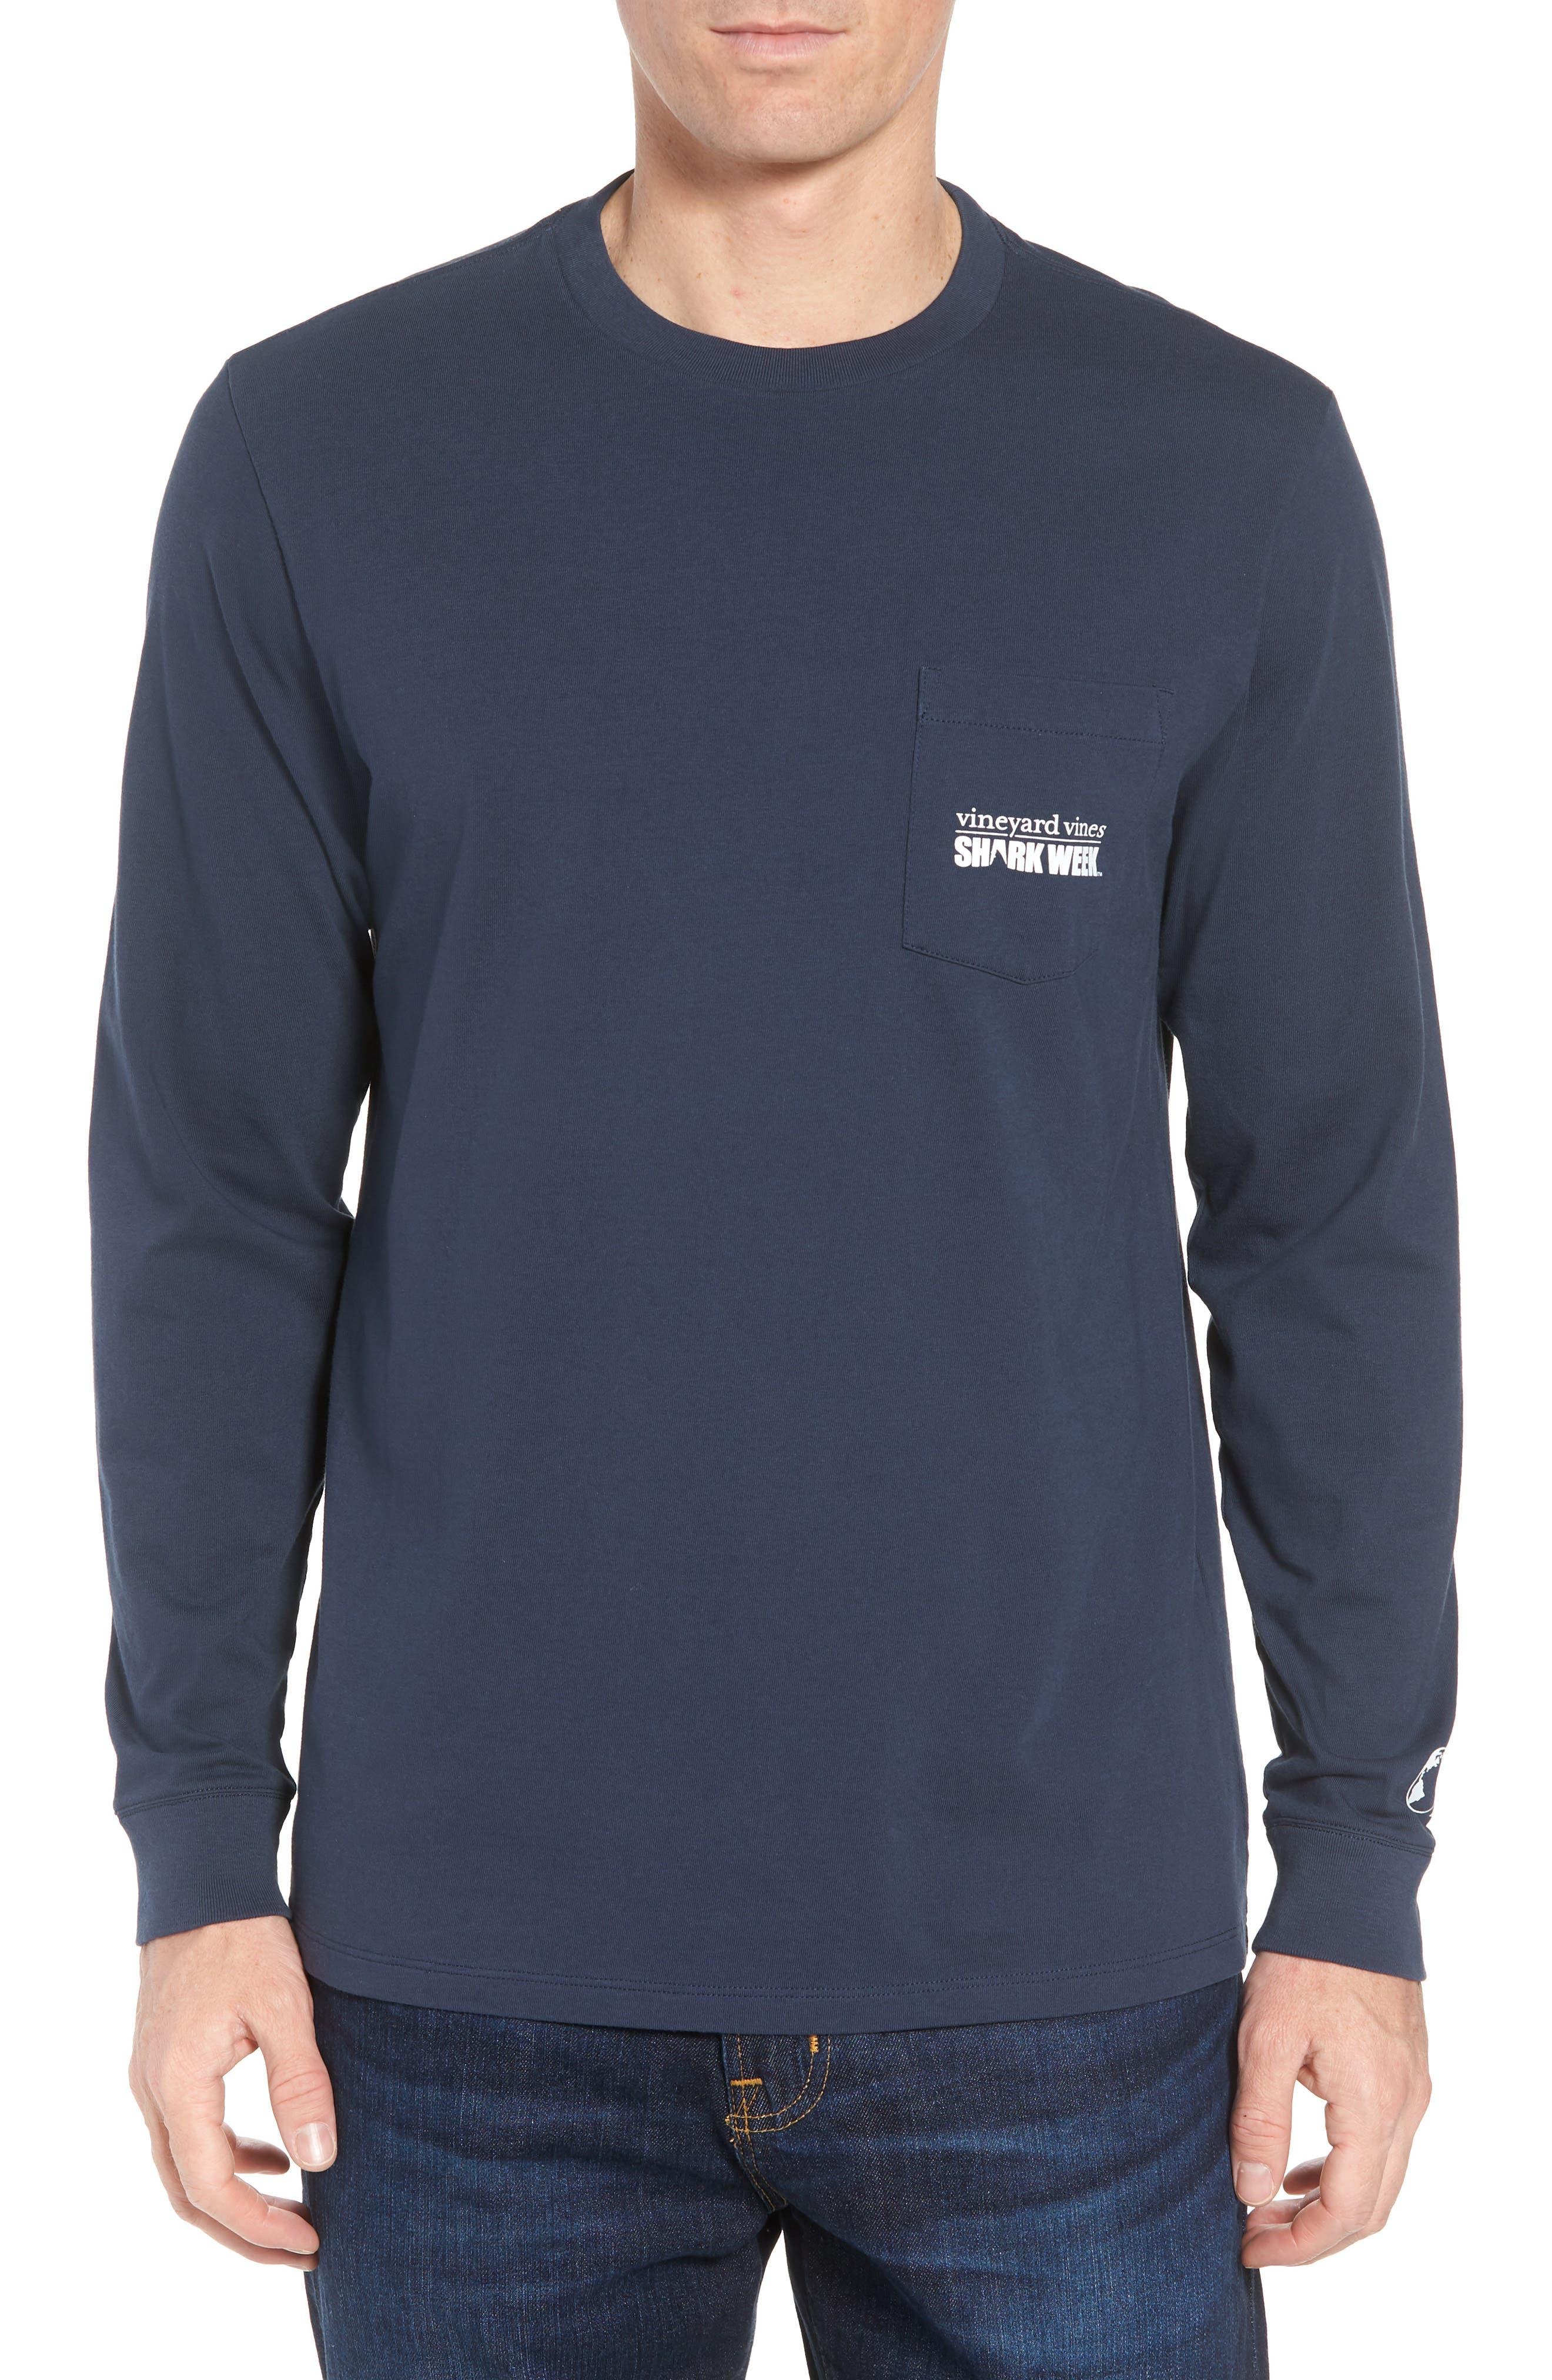 x Shark Week<sup>™</sup> Logo Long Sleeve Pocket T-Shirt,                         Main,                         color, 406